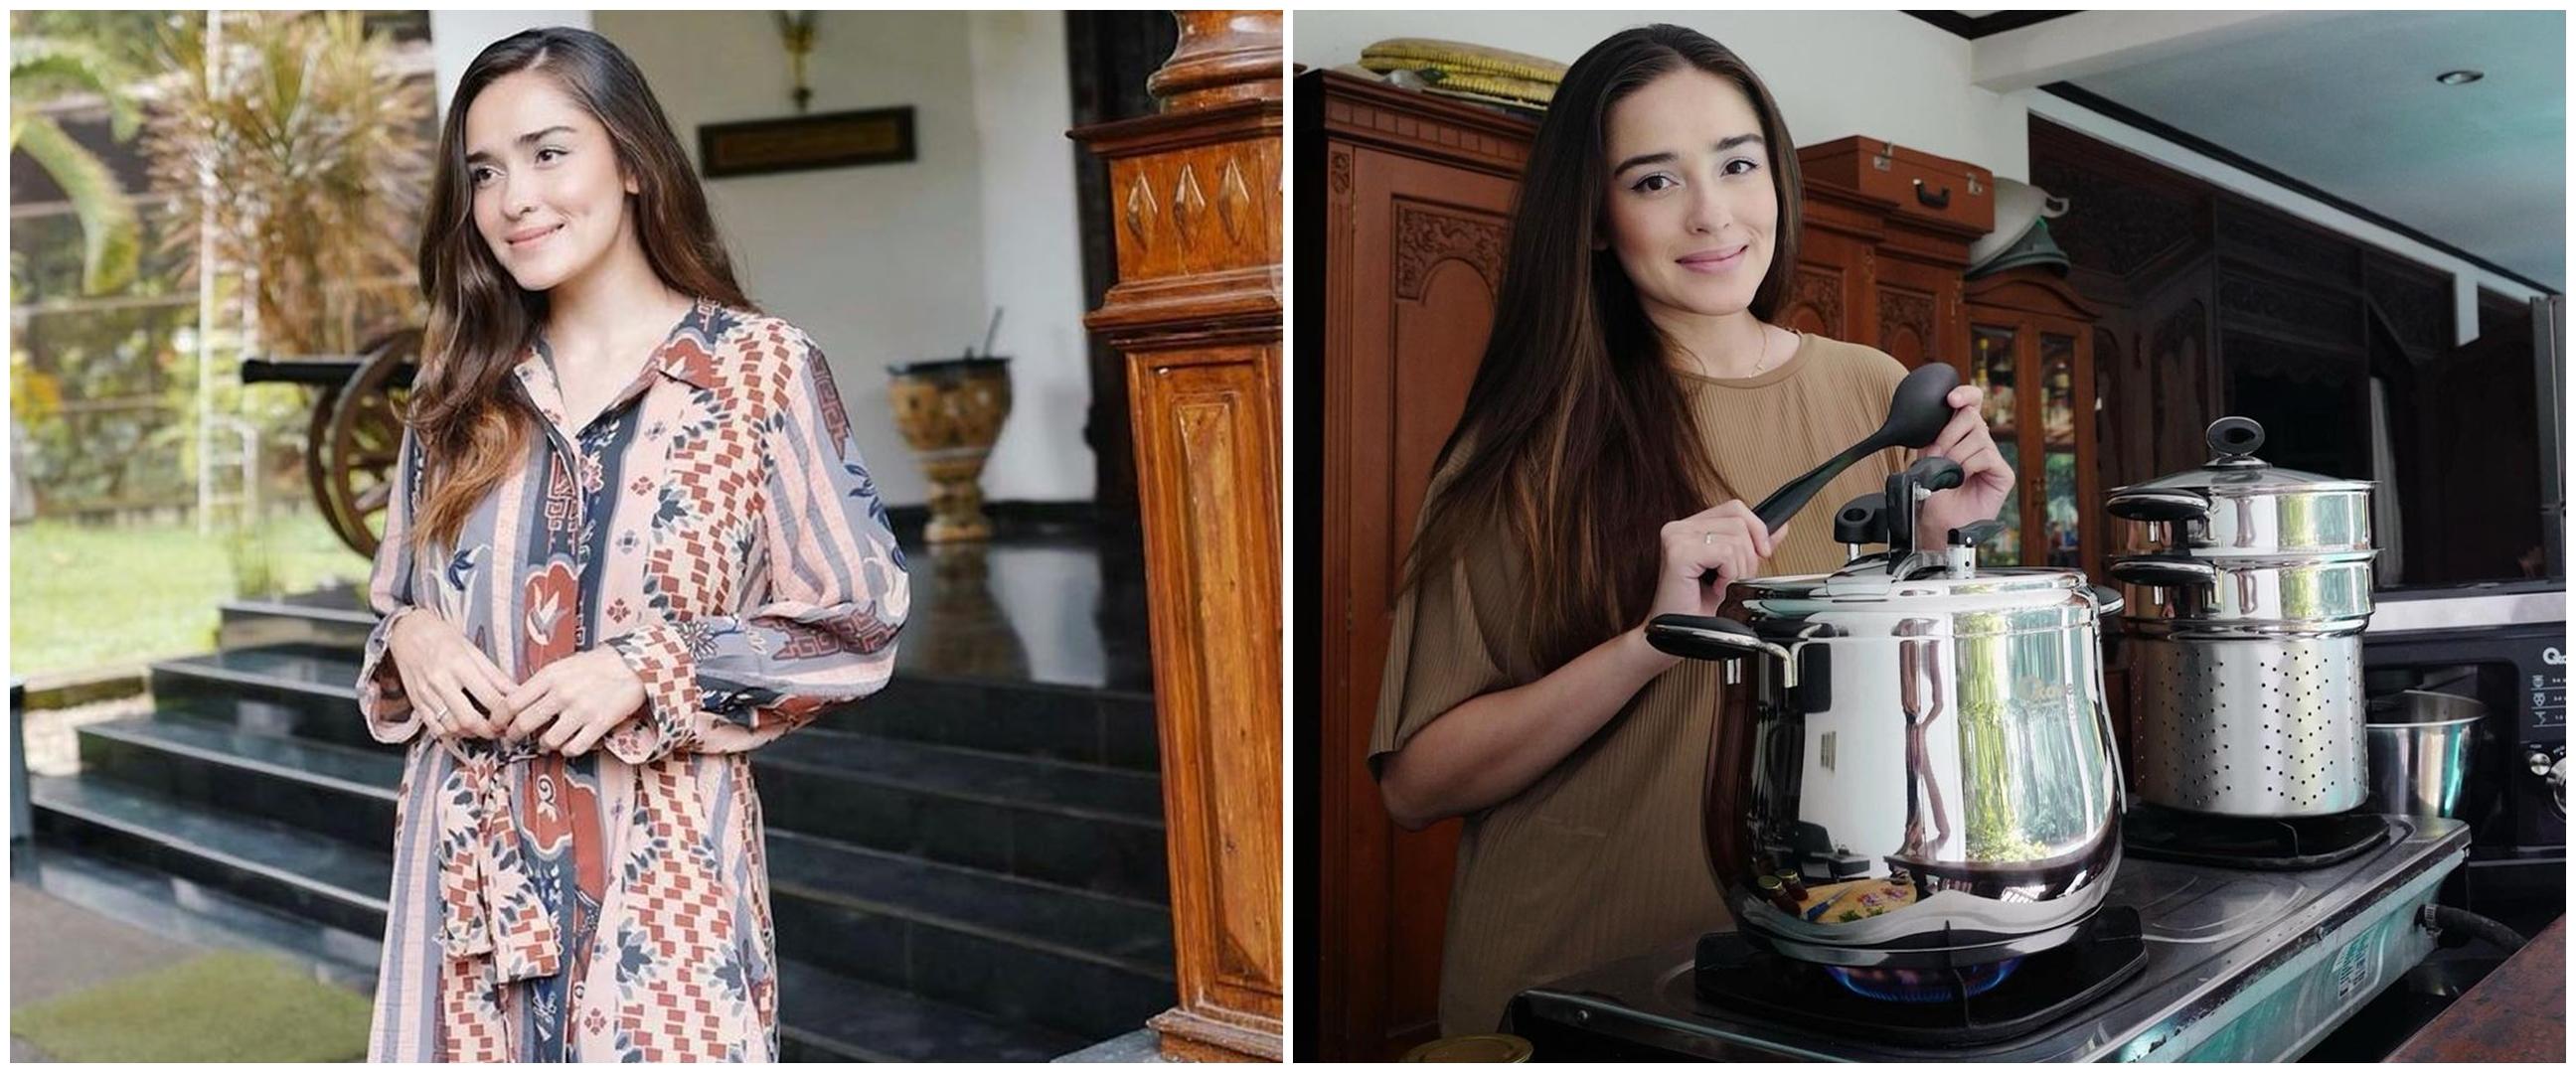 10 Penampakan rumah Yasmine Wildblood & Abi Yapto, bergaya klasik Jawa